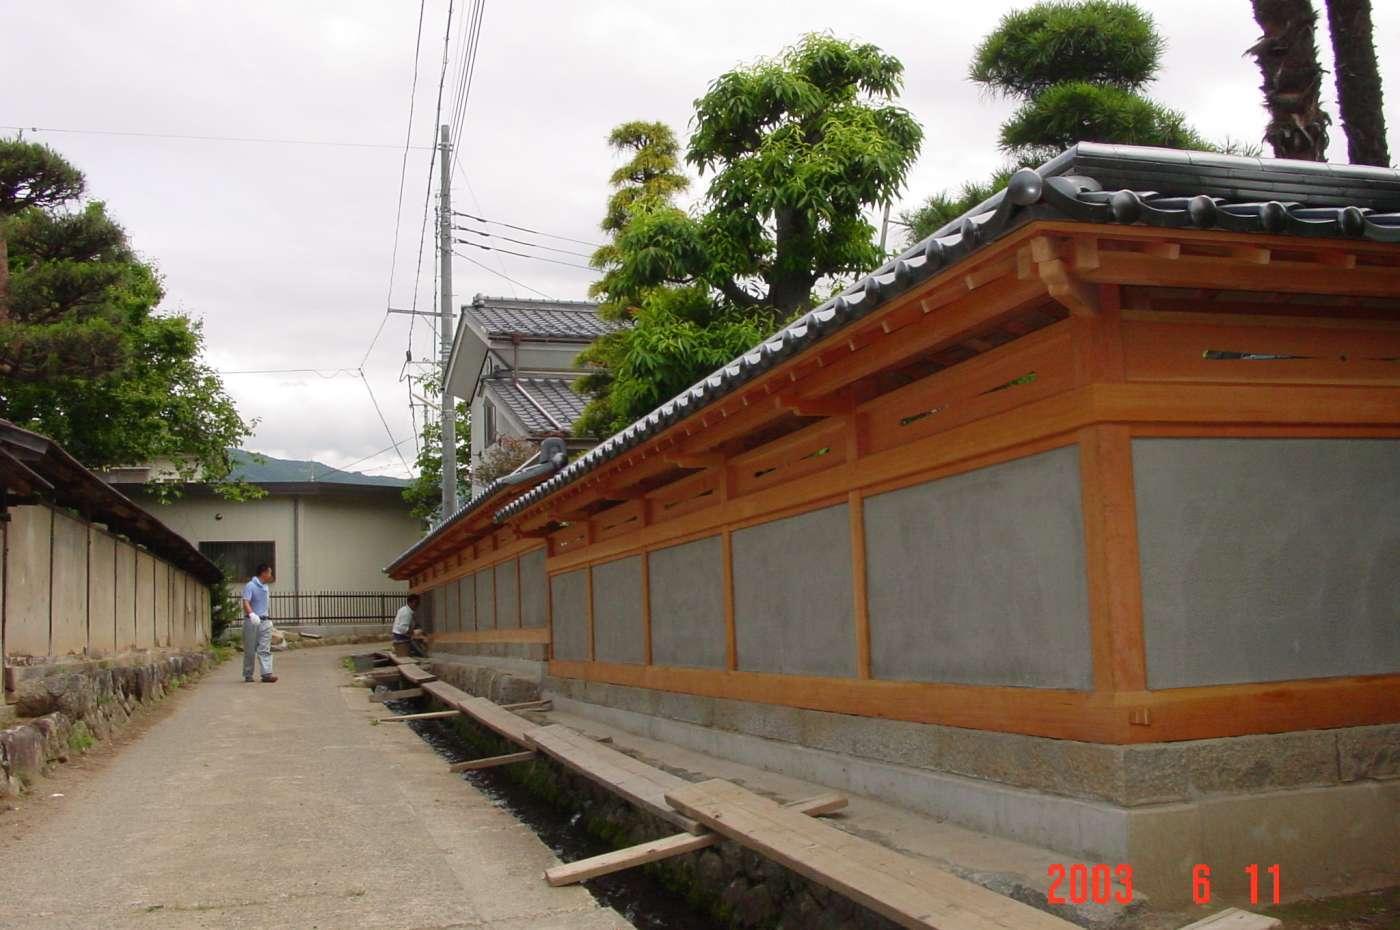 http://sumainomatsuki.com/folder1/DSC01561.JPG